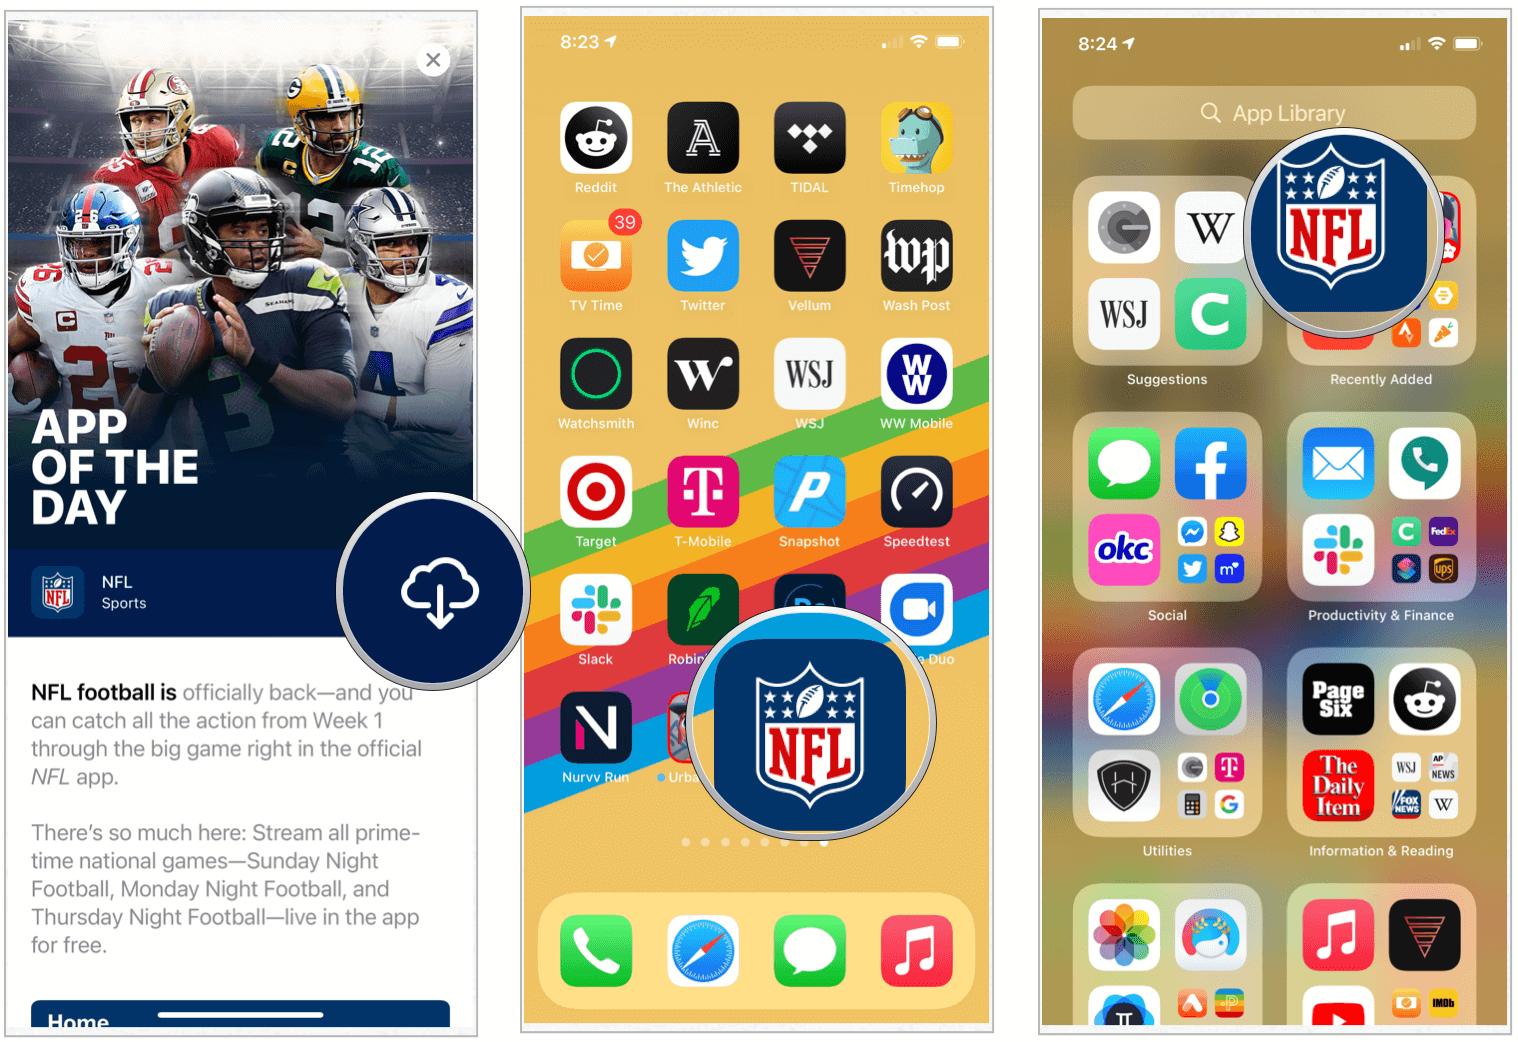 iOS 14 Home screen, App Library